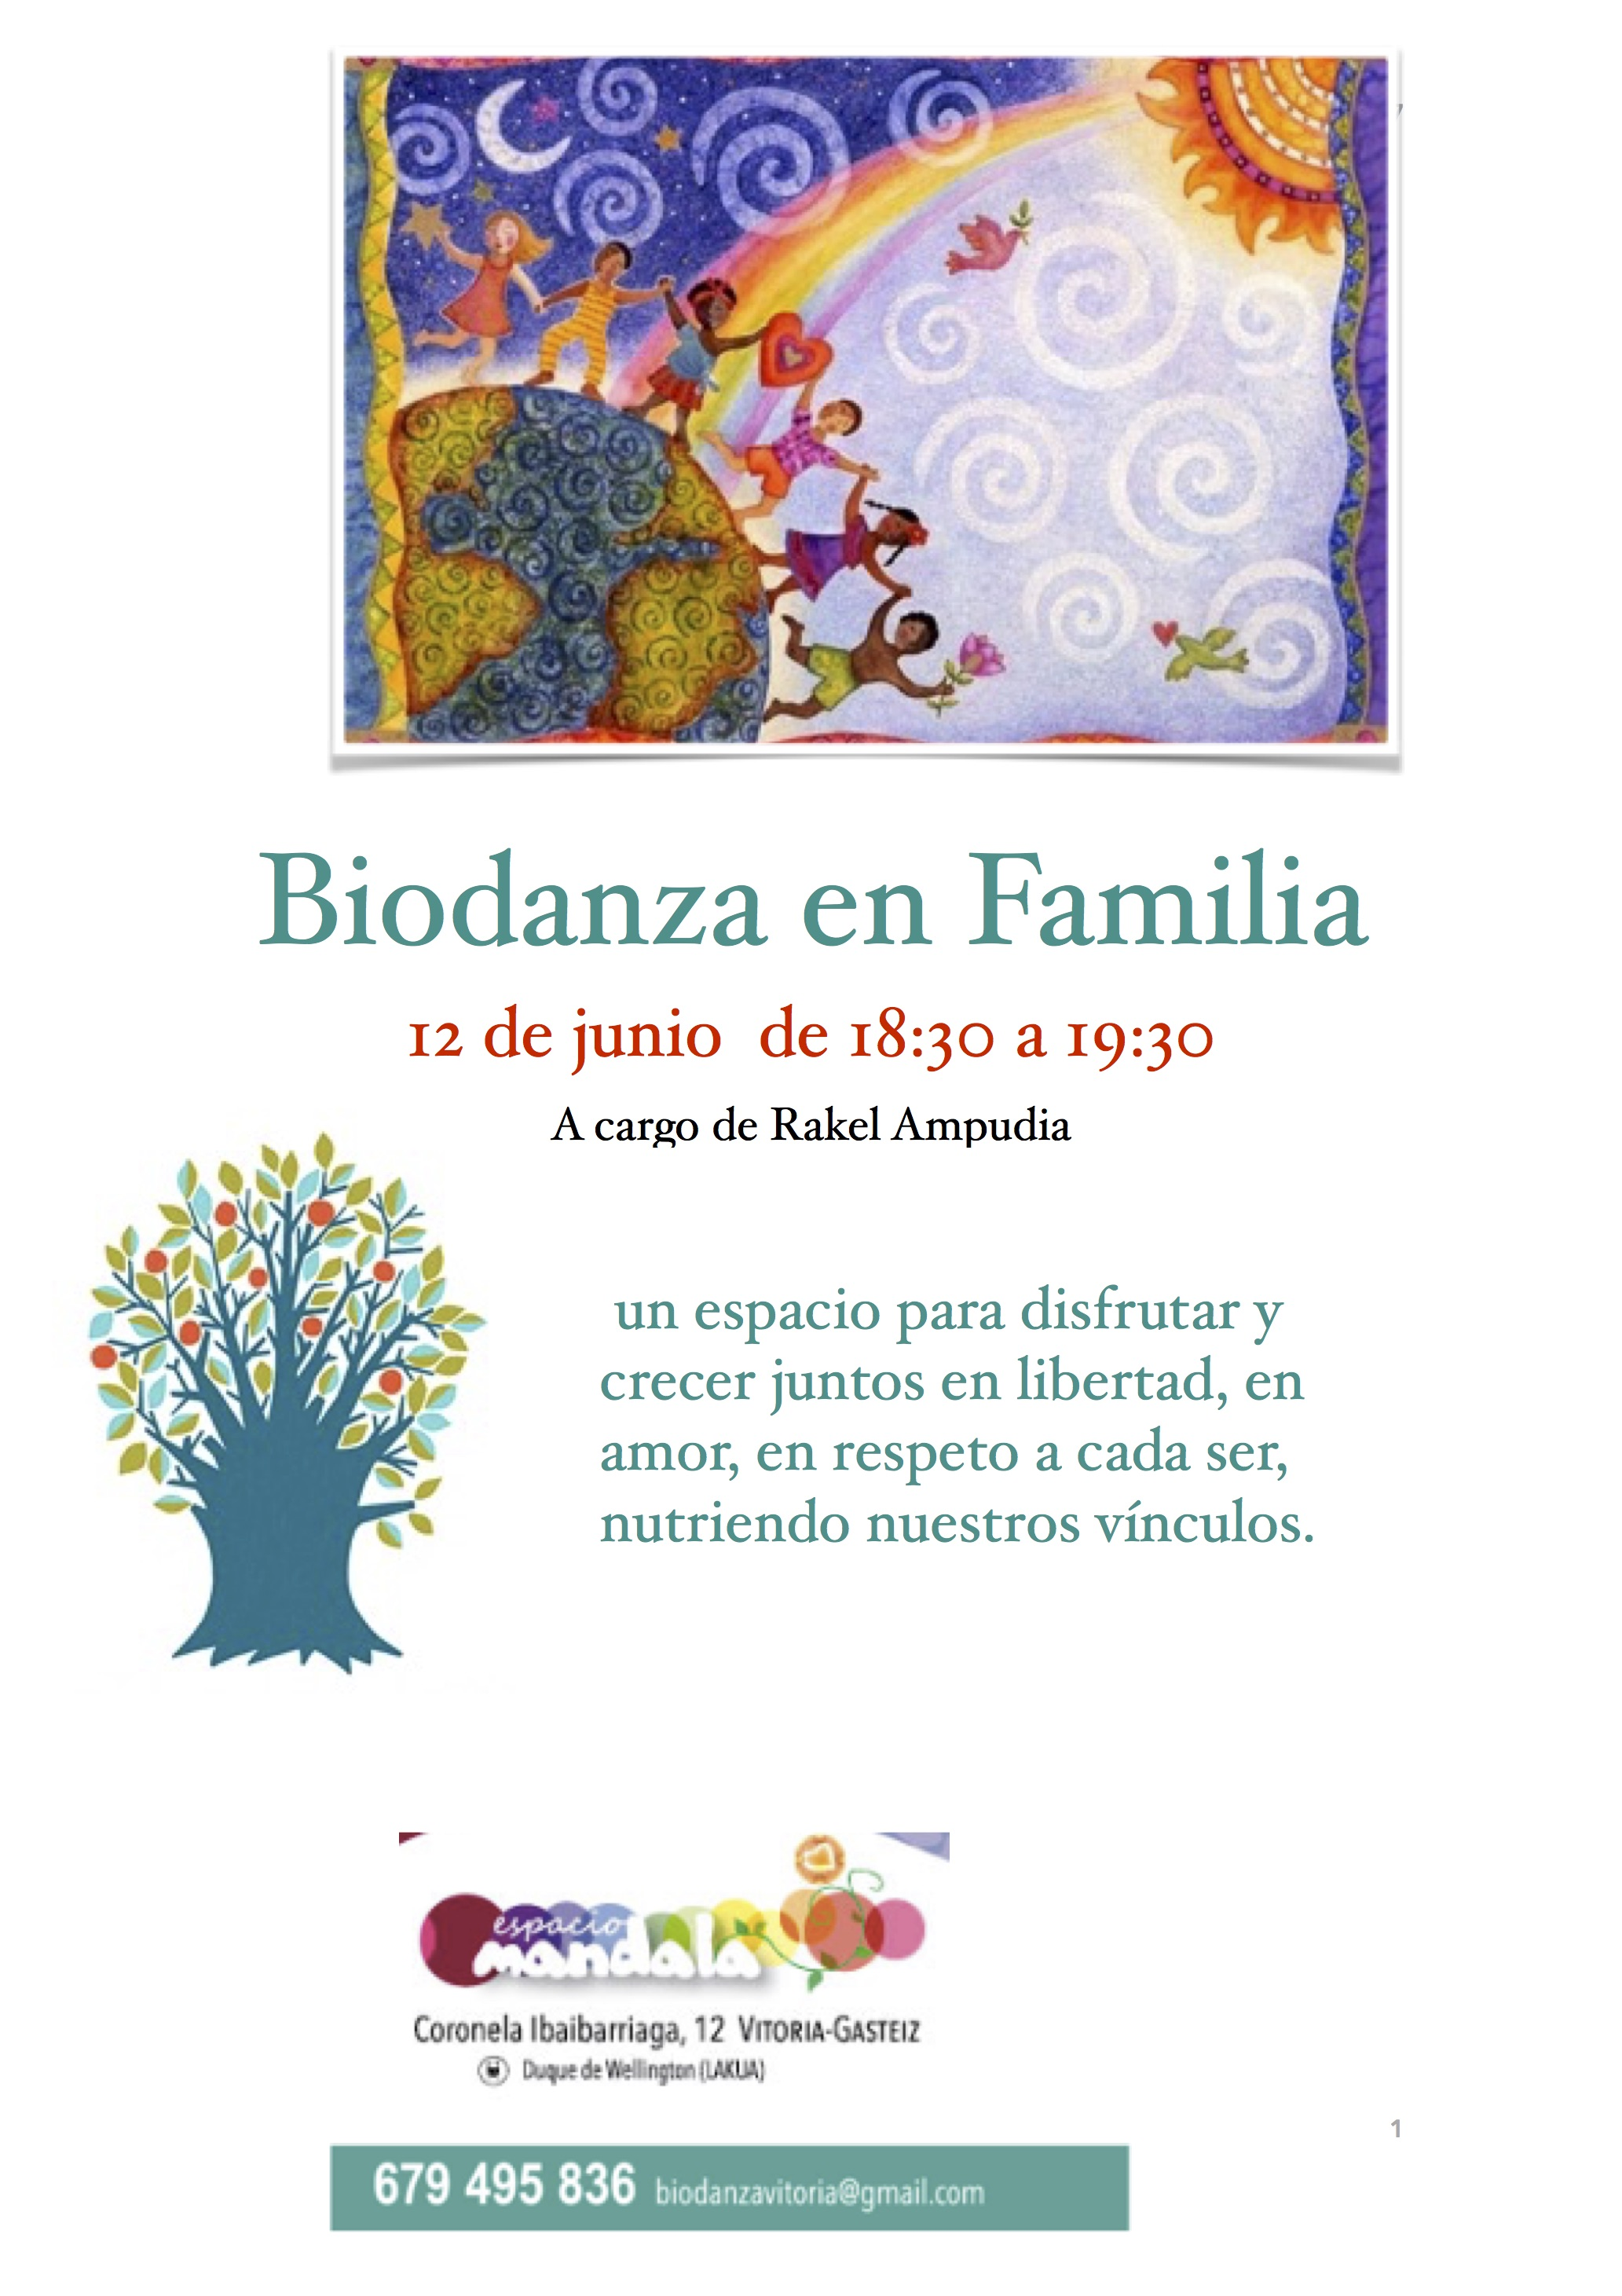 biodanza en familia 12 de junio